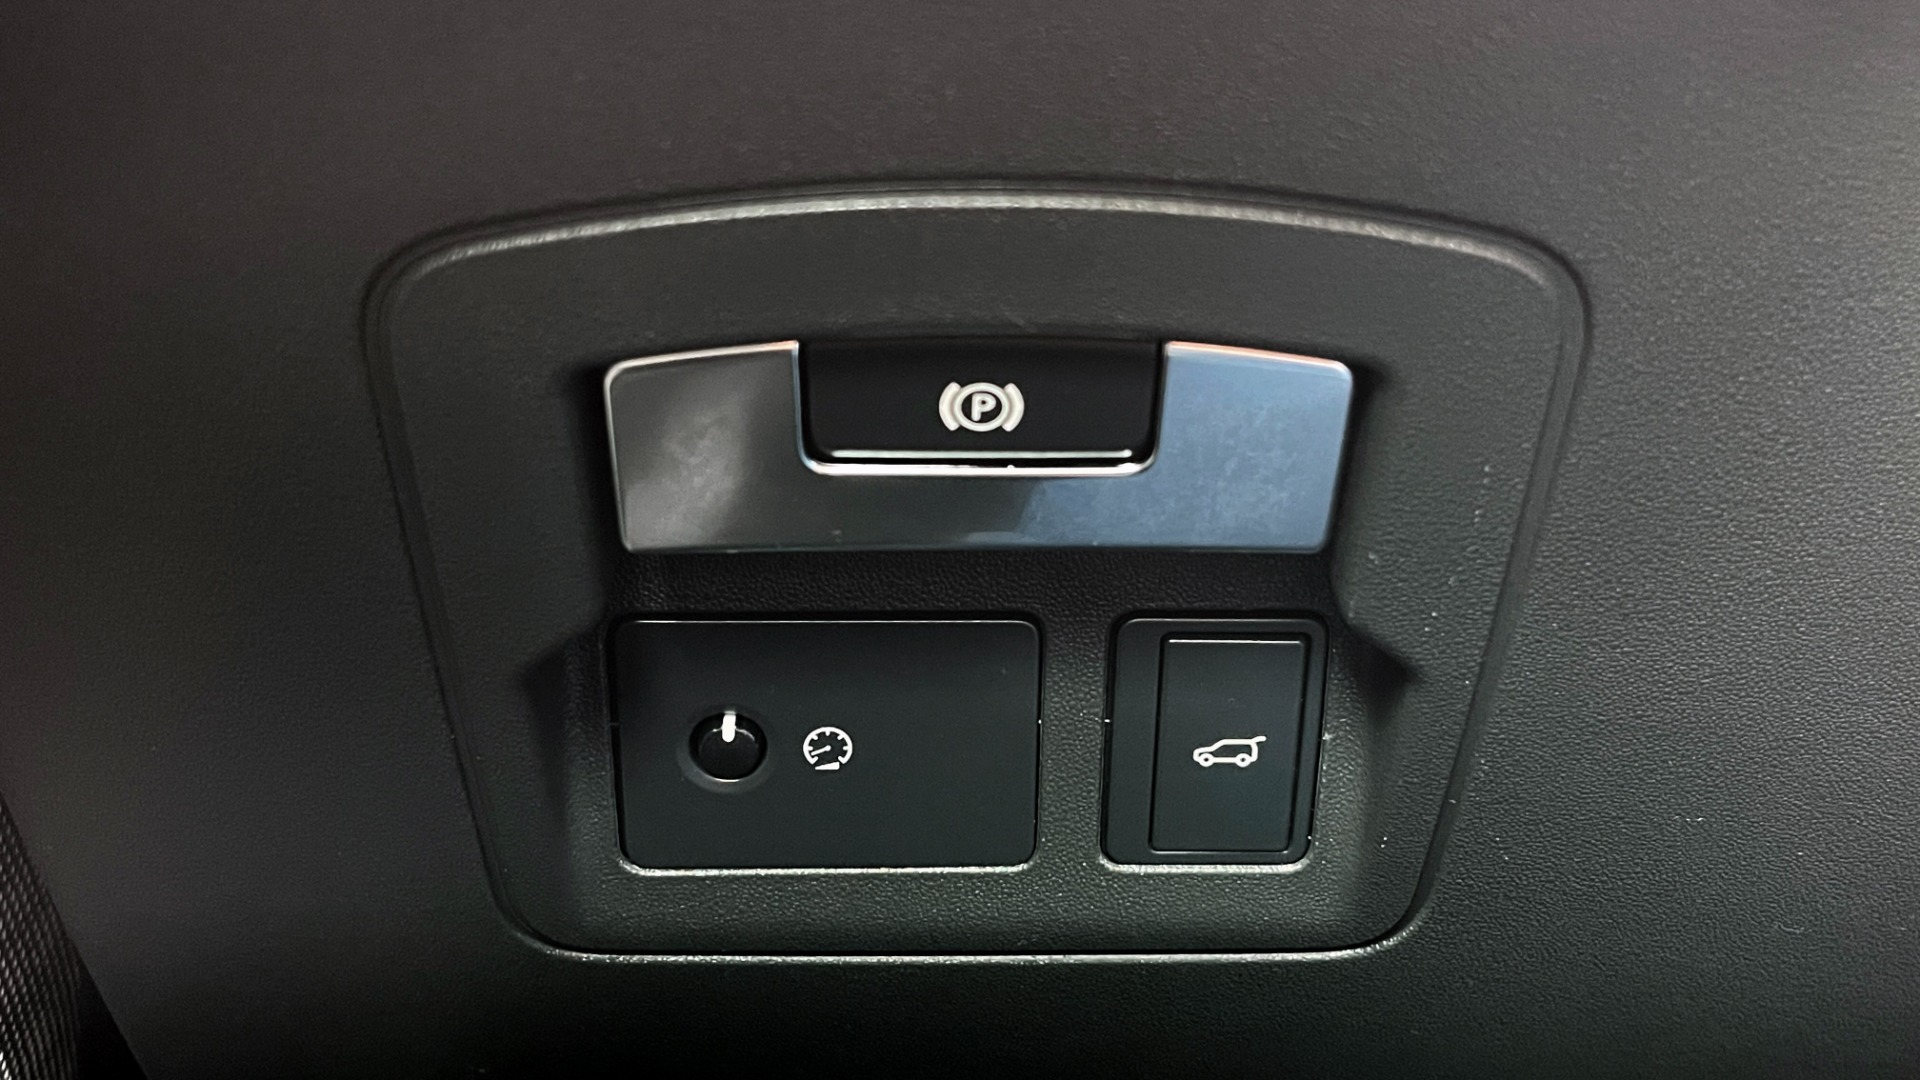 Used 2018 Land Rover RANGE ROVER VELAR R-DYNAMIC SE / NAV / PREM / MERIDIAN / SUNROOF / REARVIEW for sale $54,995 at Formula Imports in Charlotte NC 28227 33